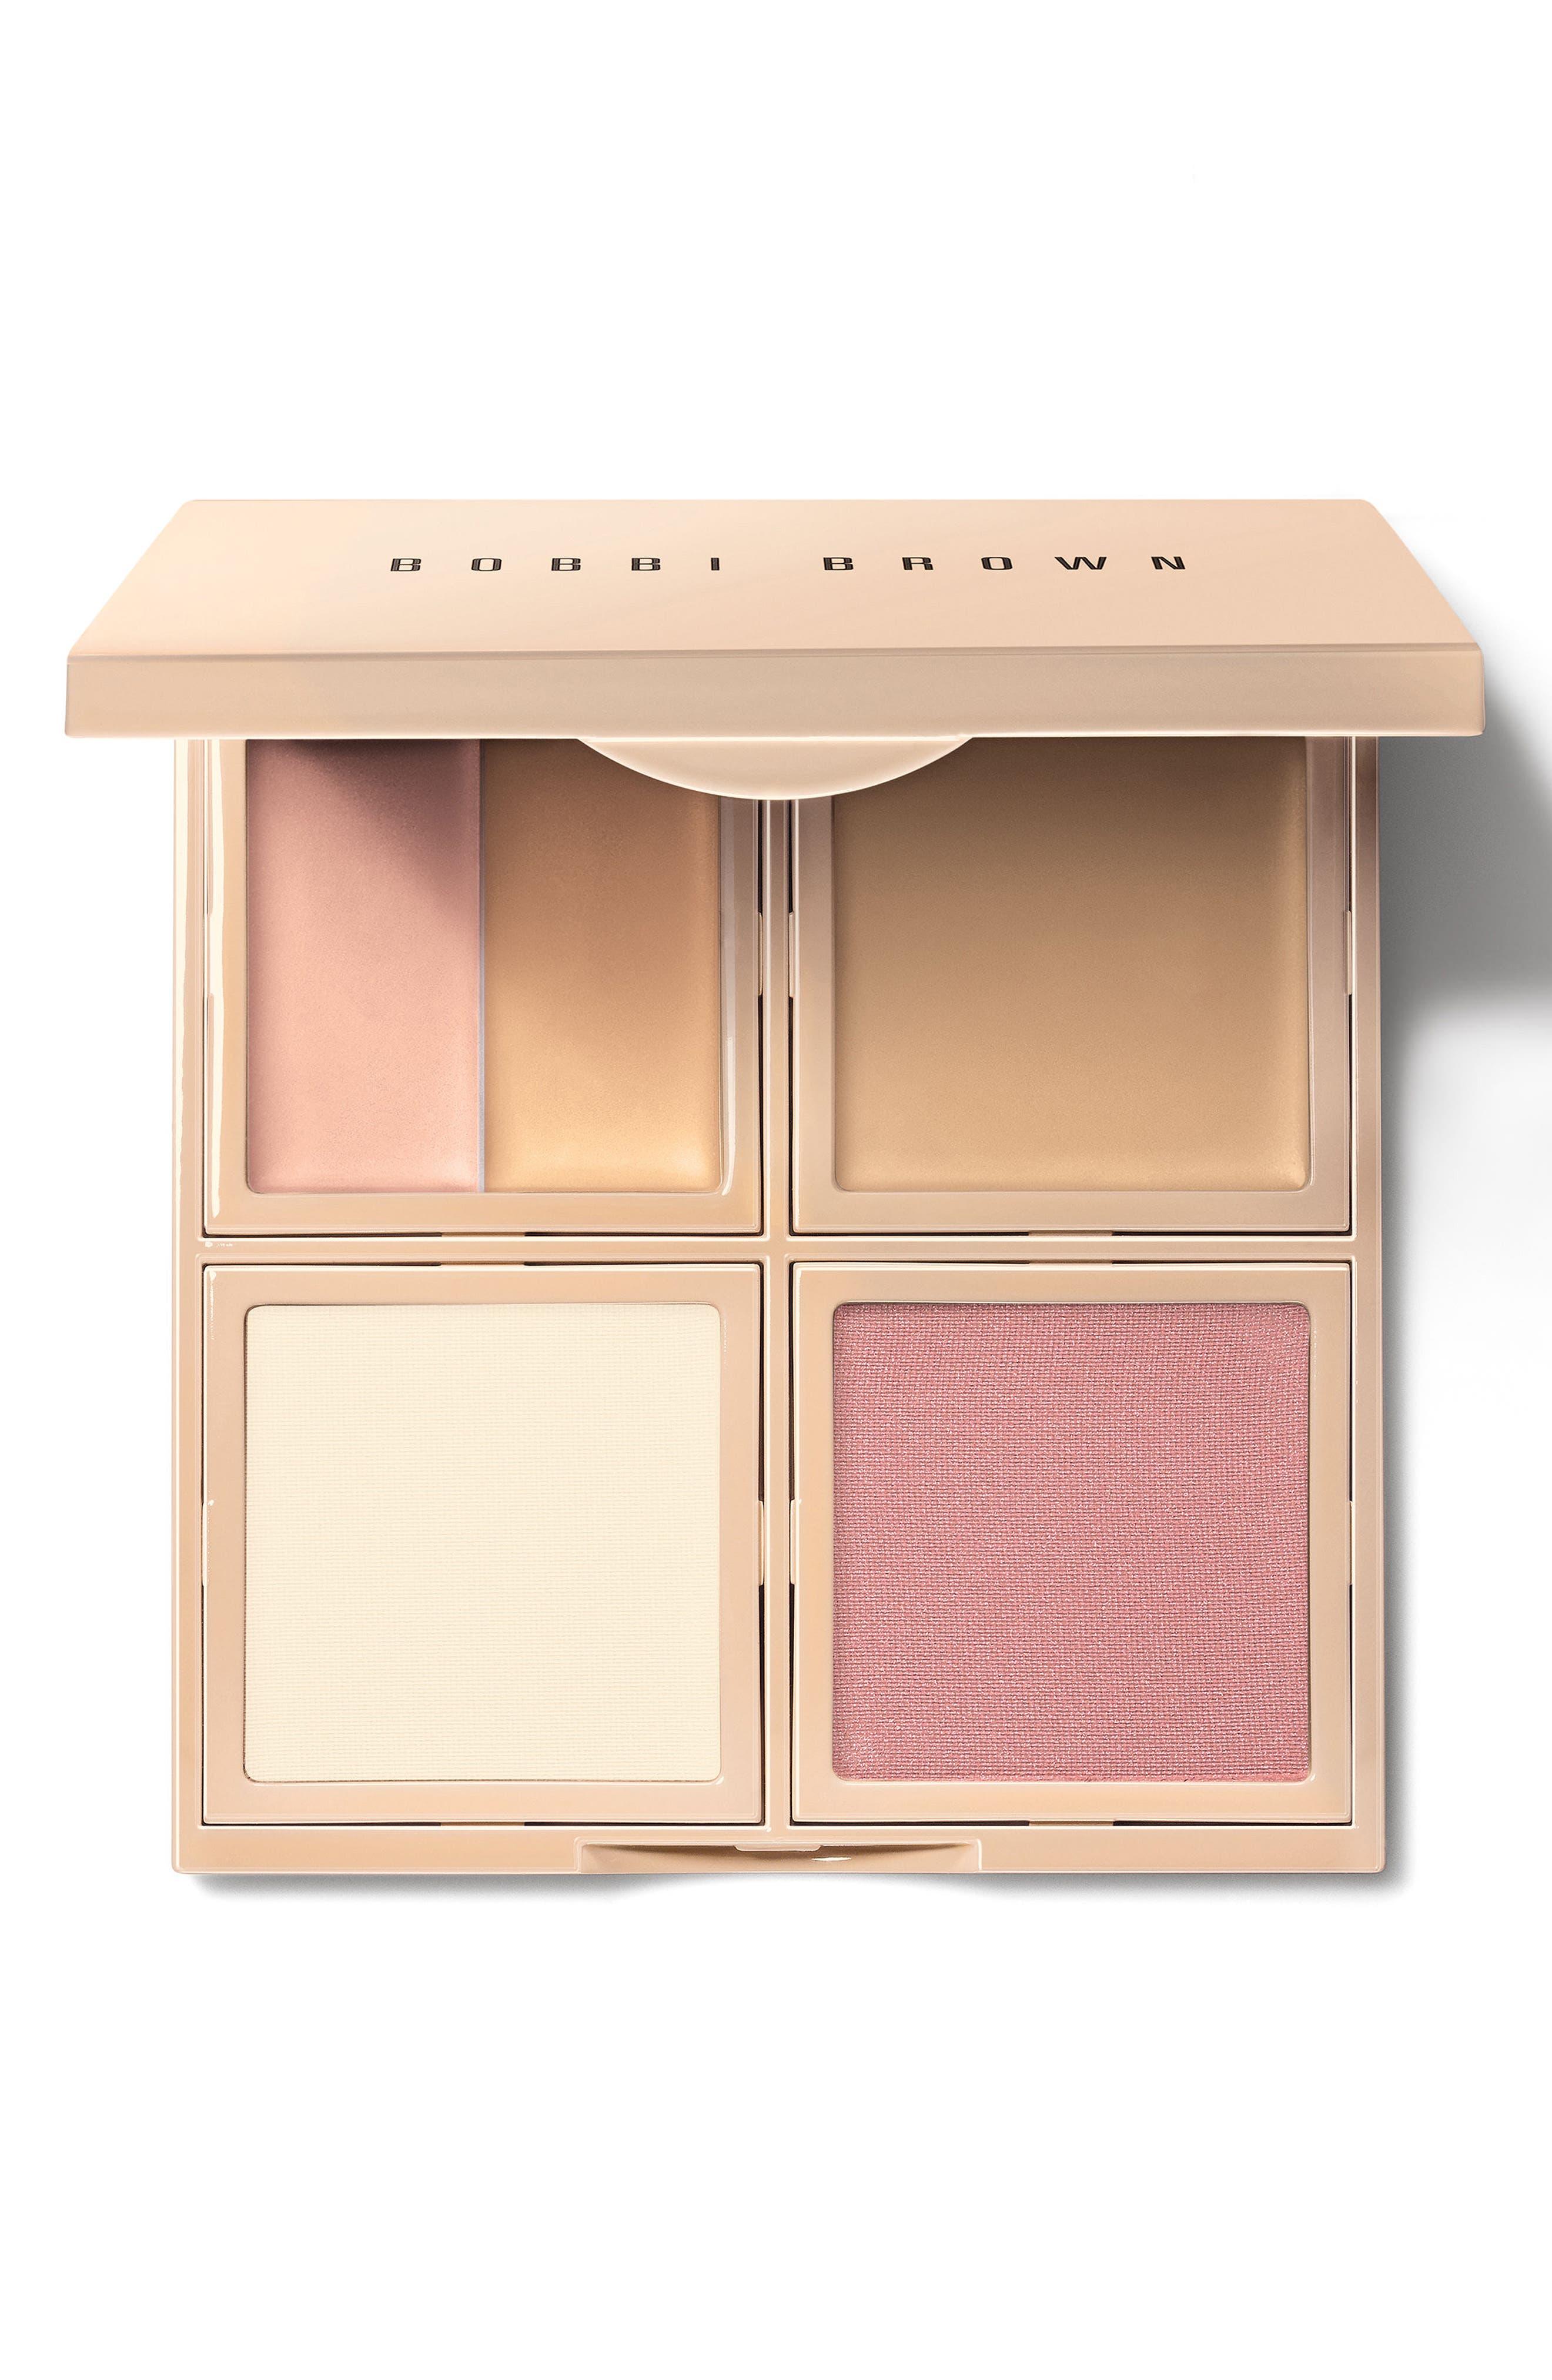 Bobbi Brown 5-in-1 Essential Face Palette (Nordstrom Exclusive) ($80 Value)